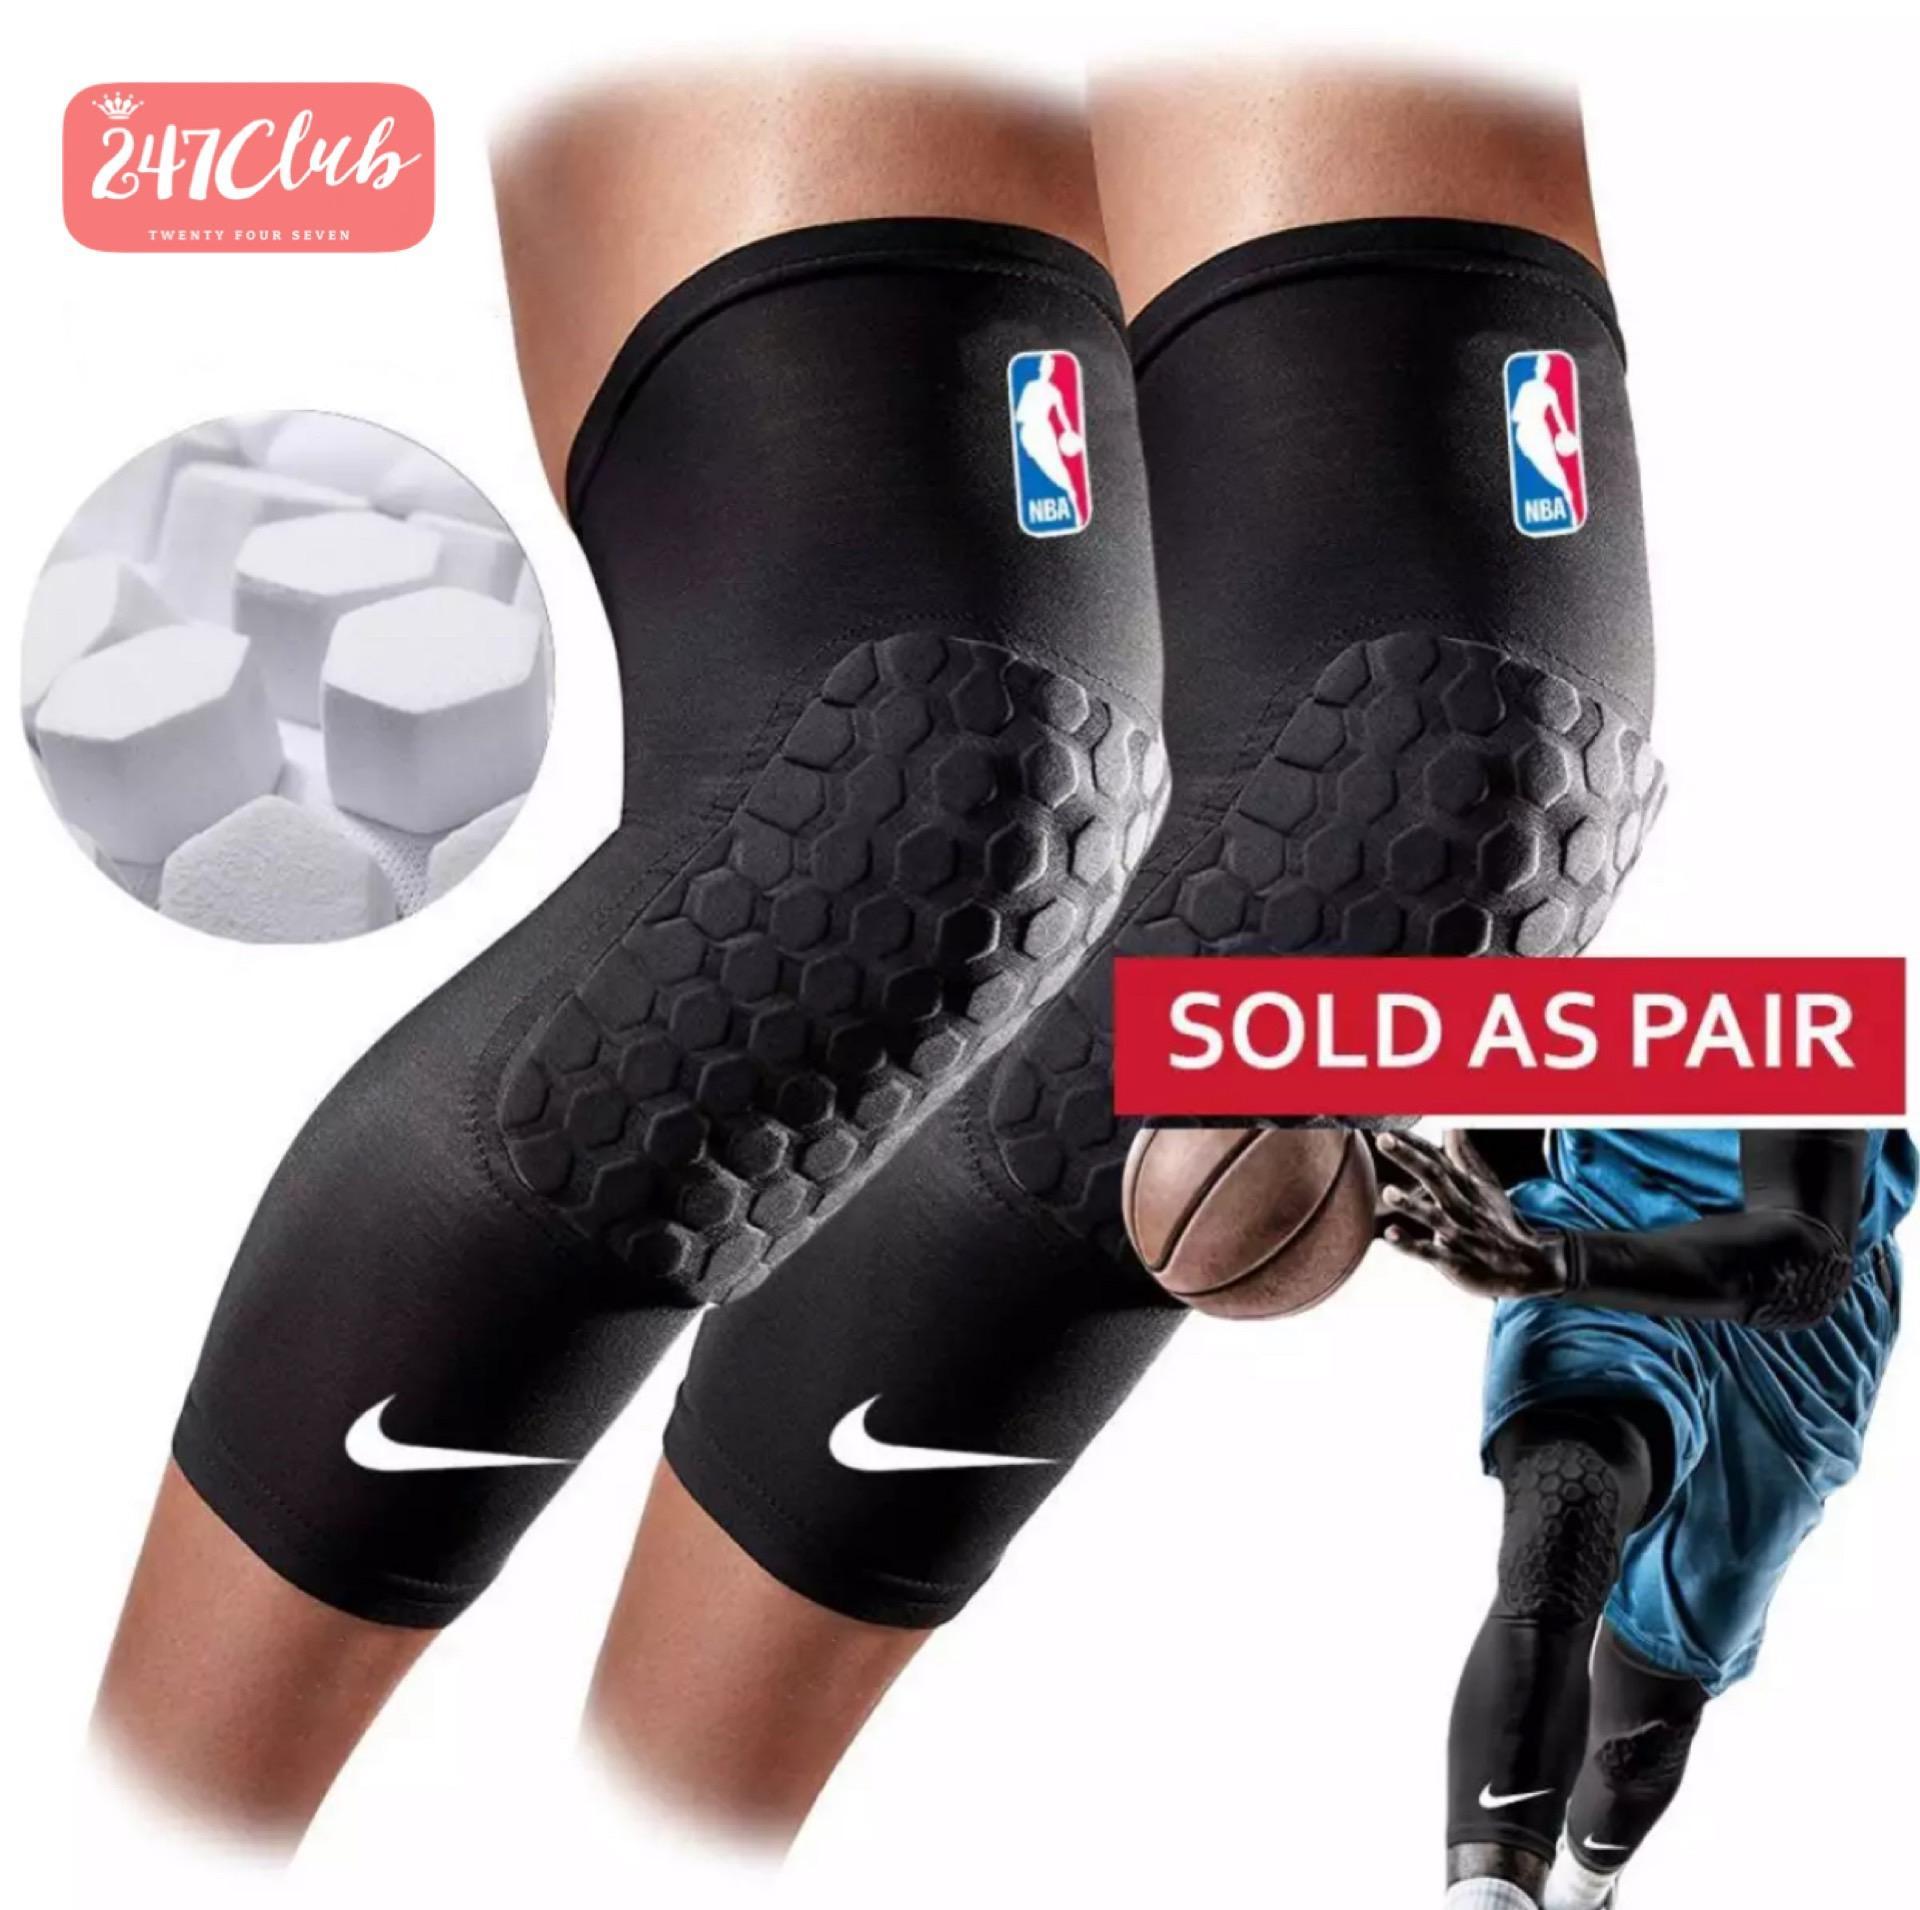 247 2pcs Nikes Padded Leg Sleeves - Knee Pad By 247shop.